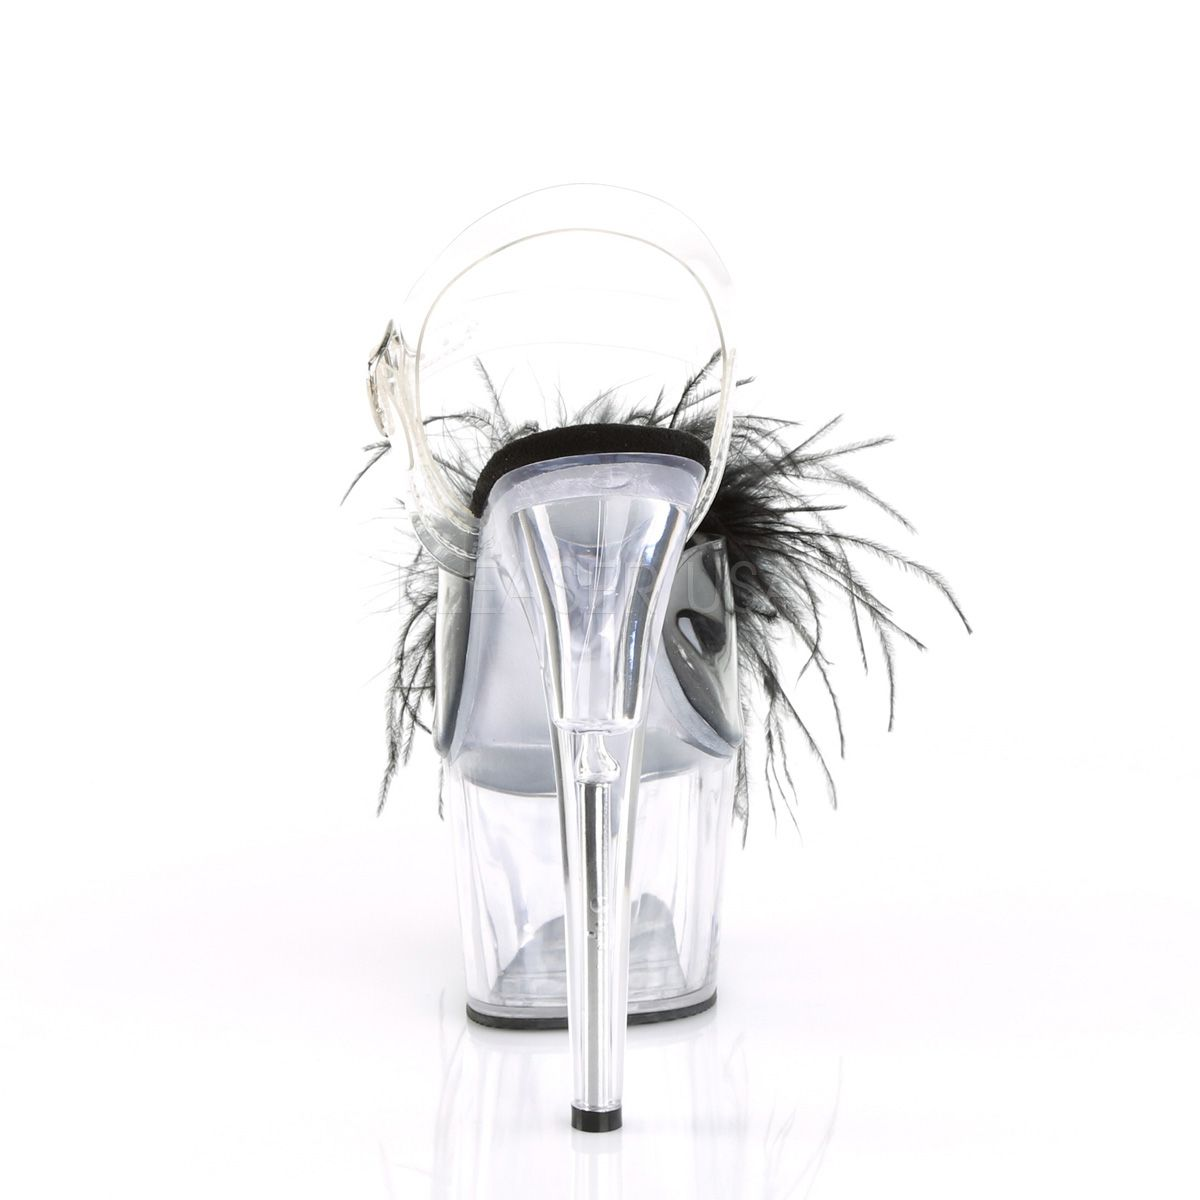 Sandalias de Plataforma Transparente con Plumas de Marabou y Perlas